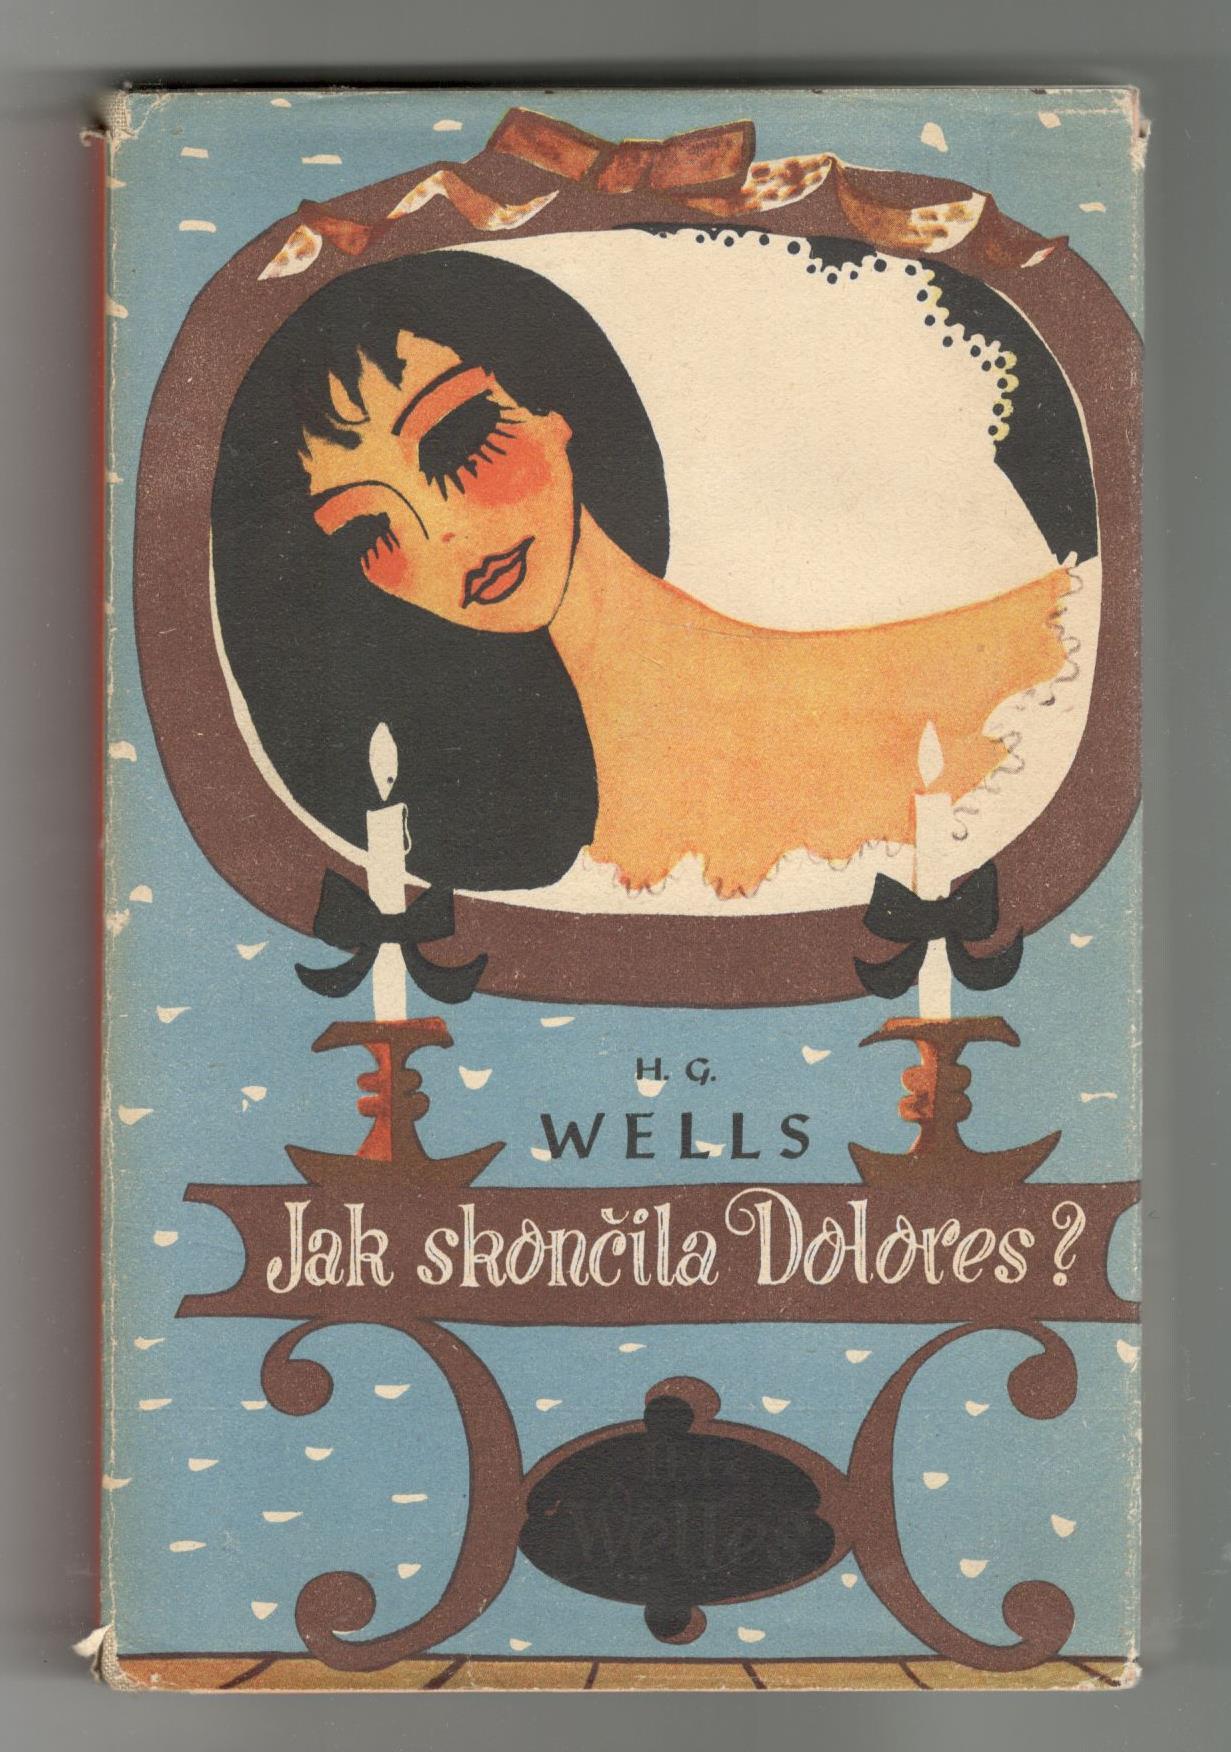 Jak skončila Dolores? - H. G. Wells